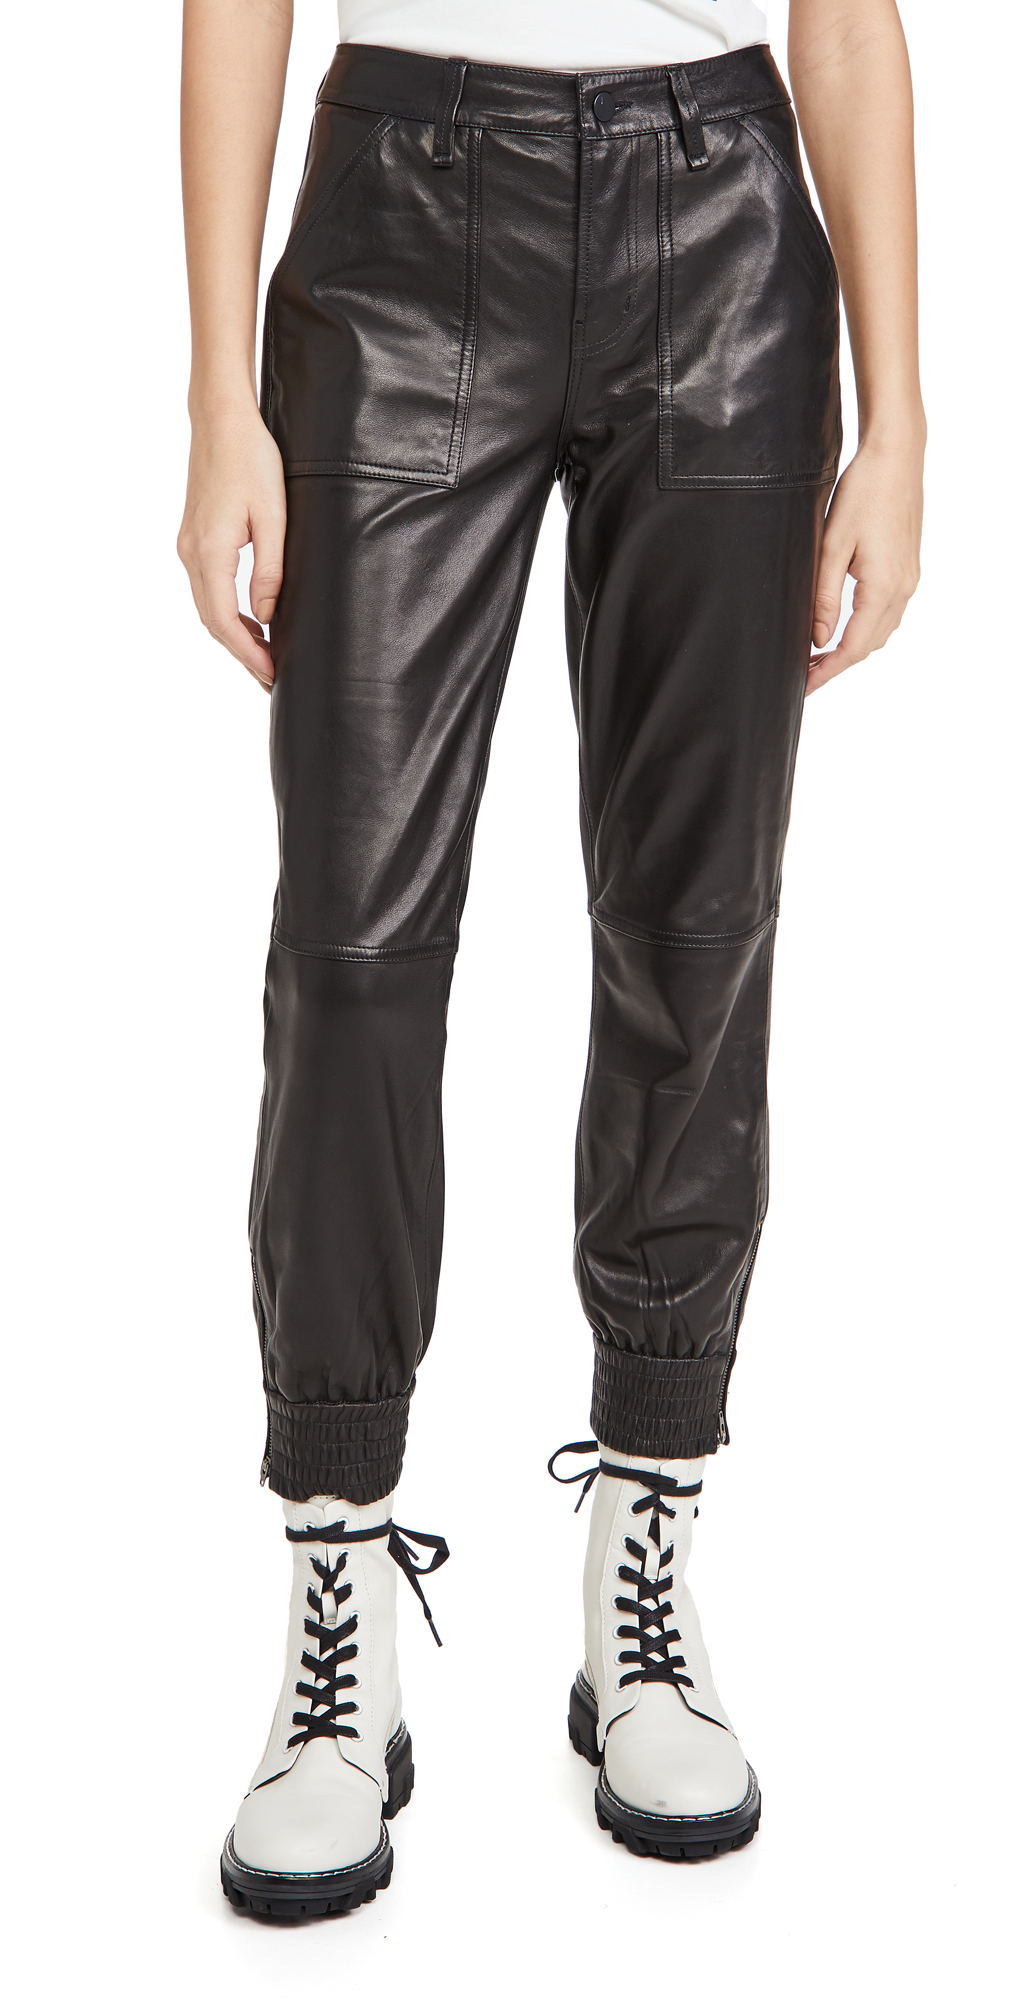 J Brand Arkin Leather Zip Joggers